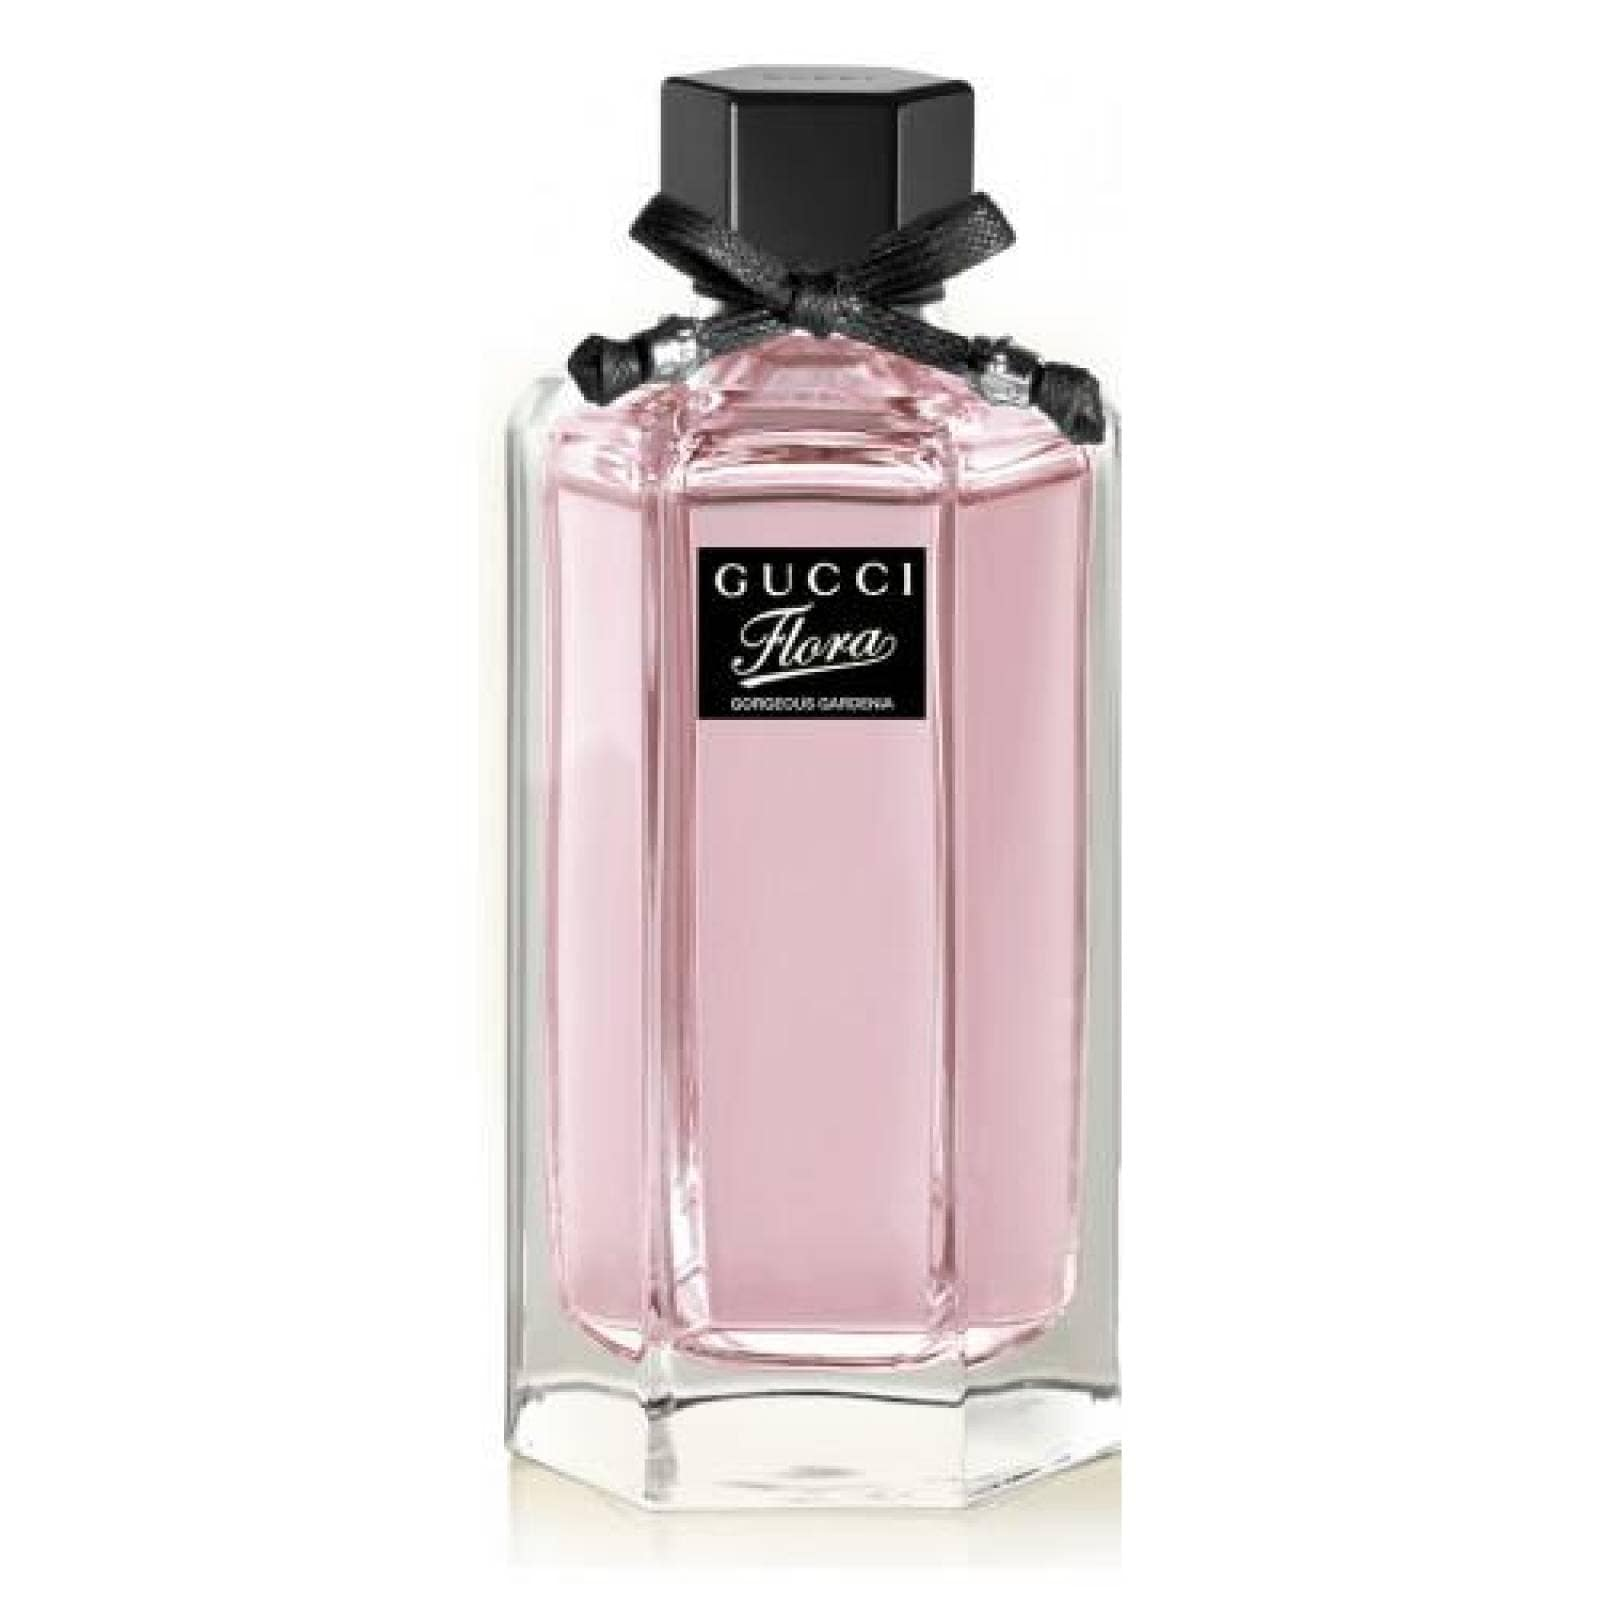 Flora Parfum de Gucci Dama de 100 ml